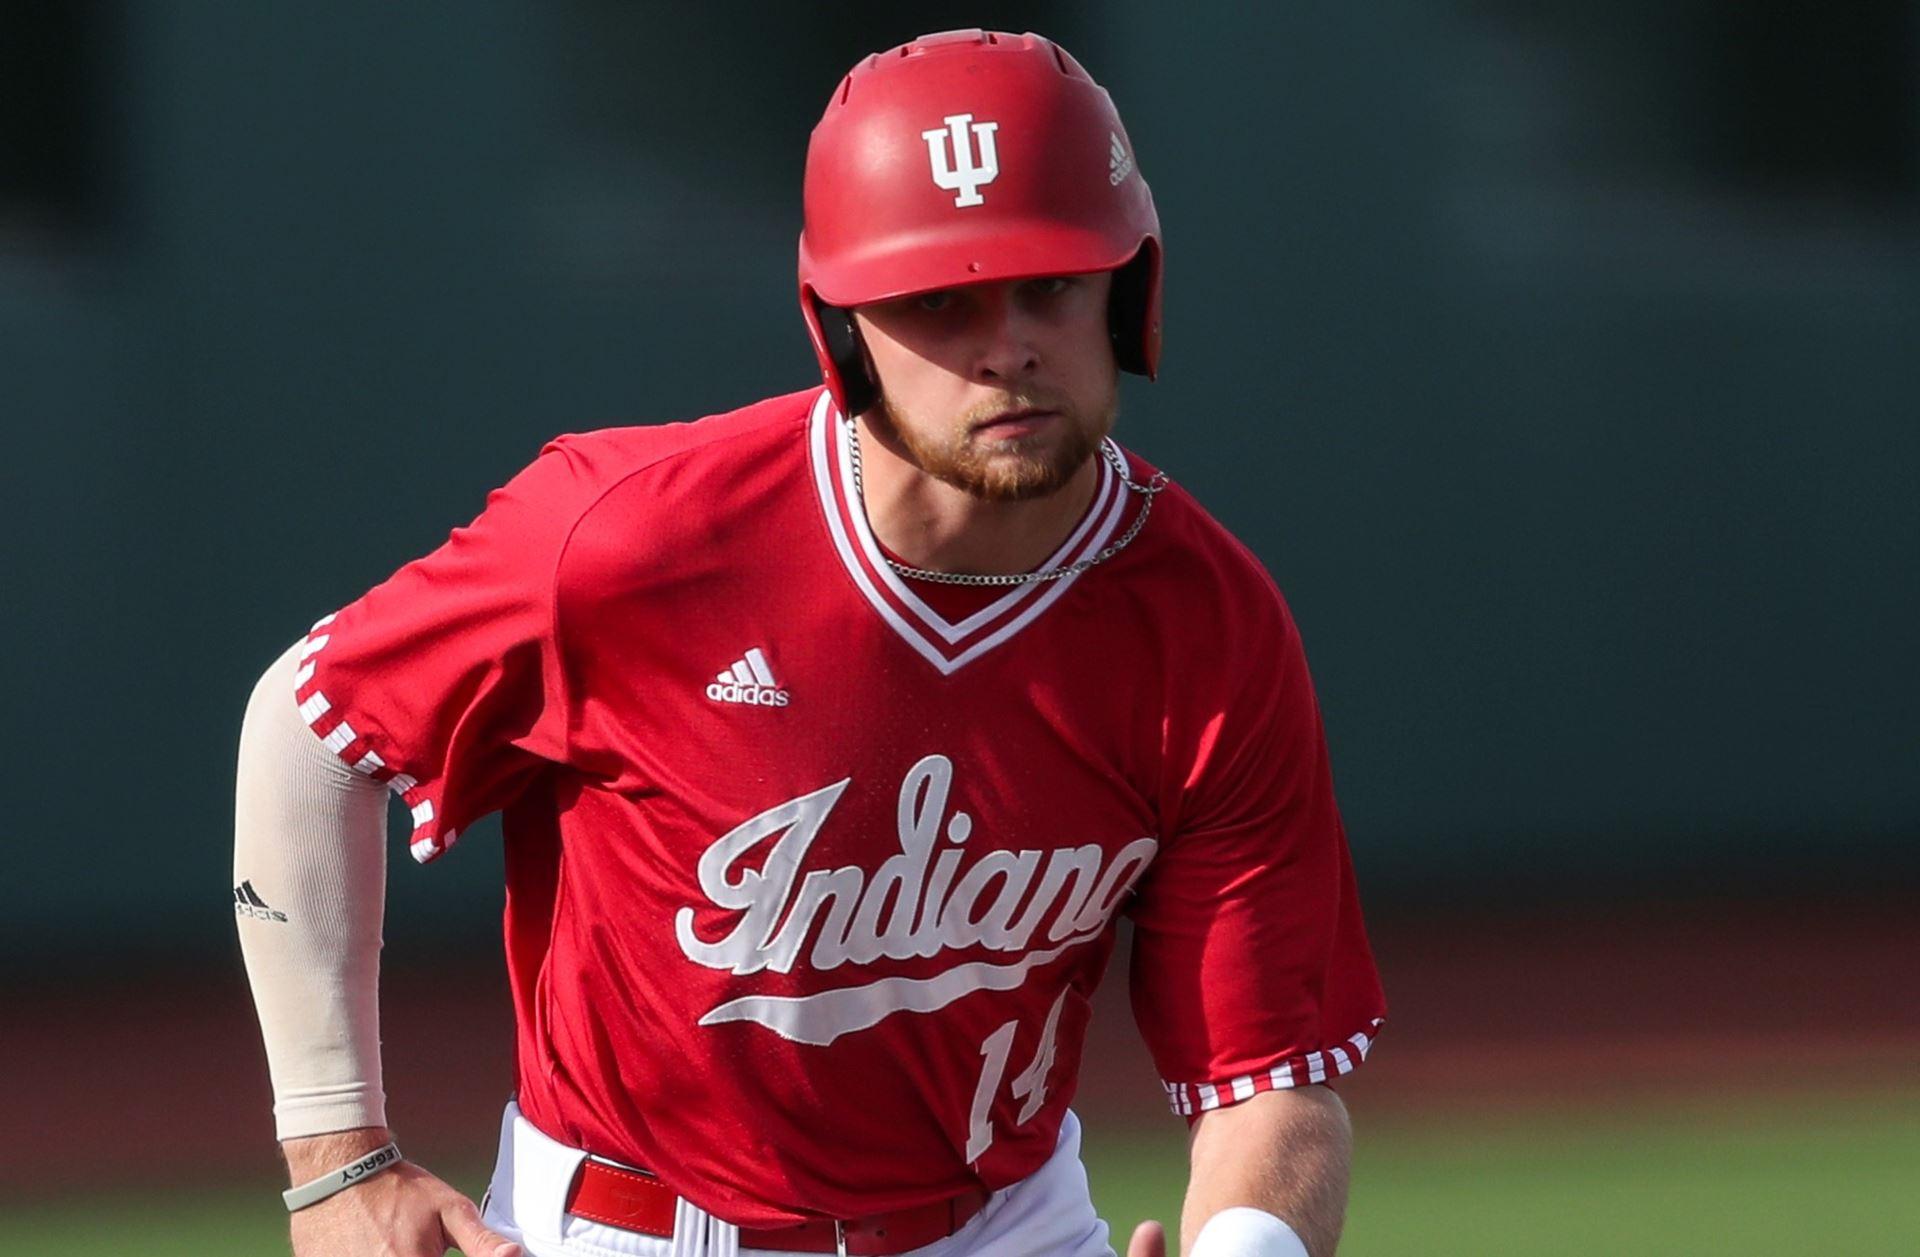 Okotoks Dawgs and Junior National Team alum Matt Lloyd (Okotoks, Alta.) had five home runs for the Indiana Hoosiers during the past week. Photo: Indiana Hoosiers Athletics